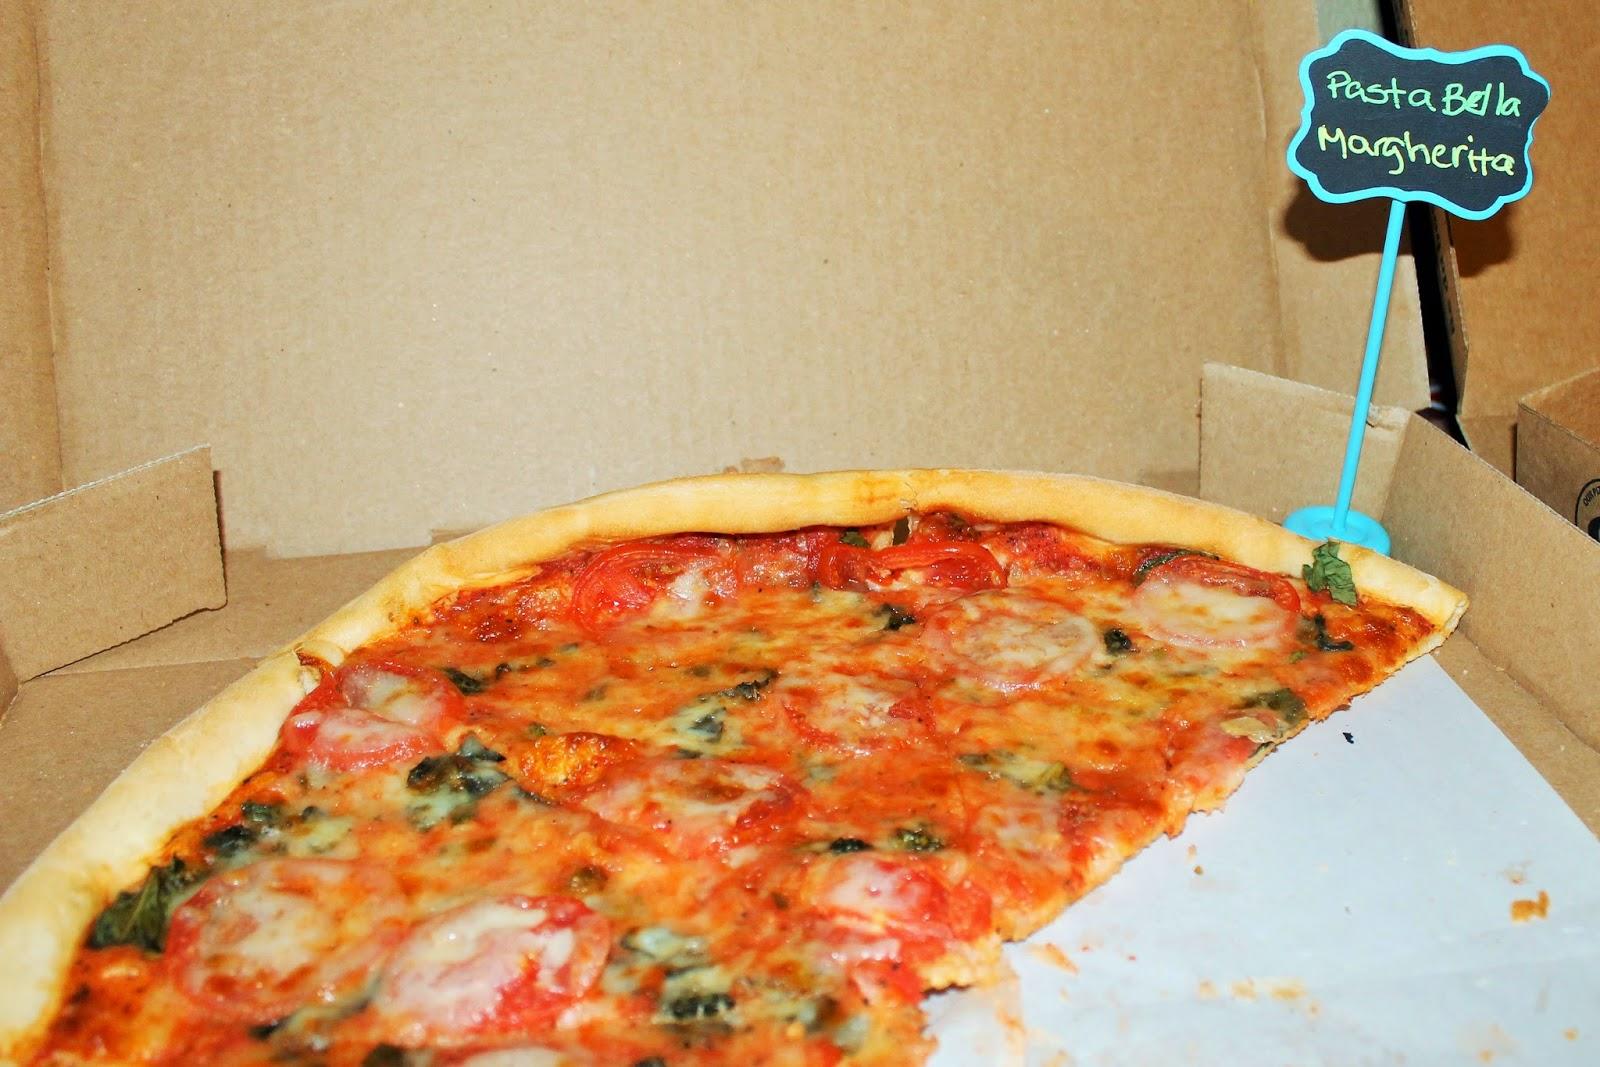 Pasta Bella Margherita Pizza, Mason City #PizzaTasteOff2015